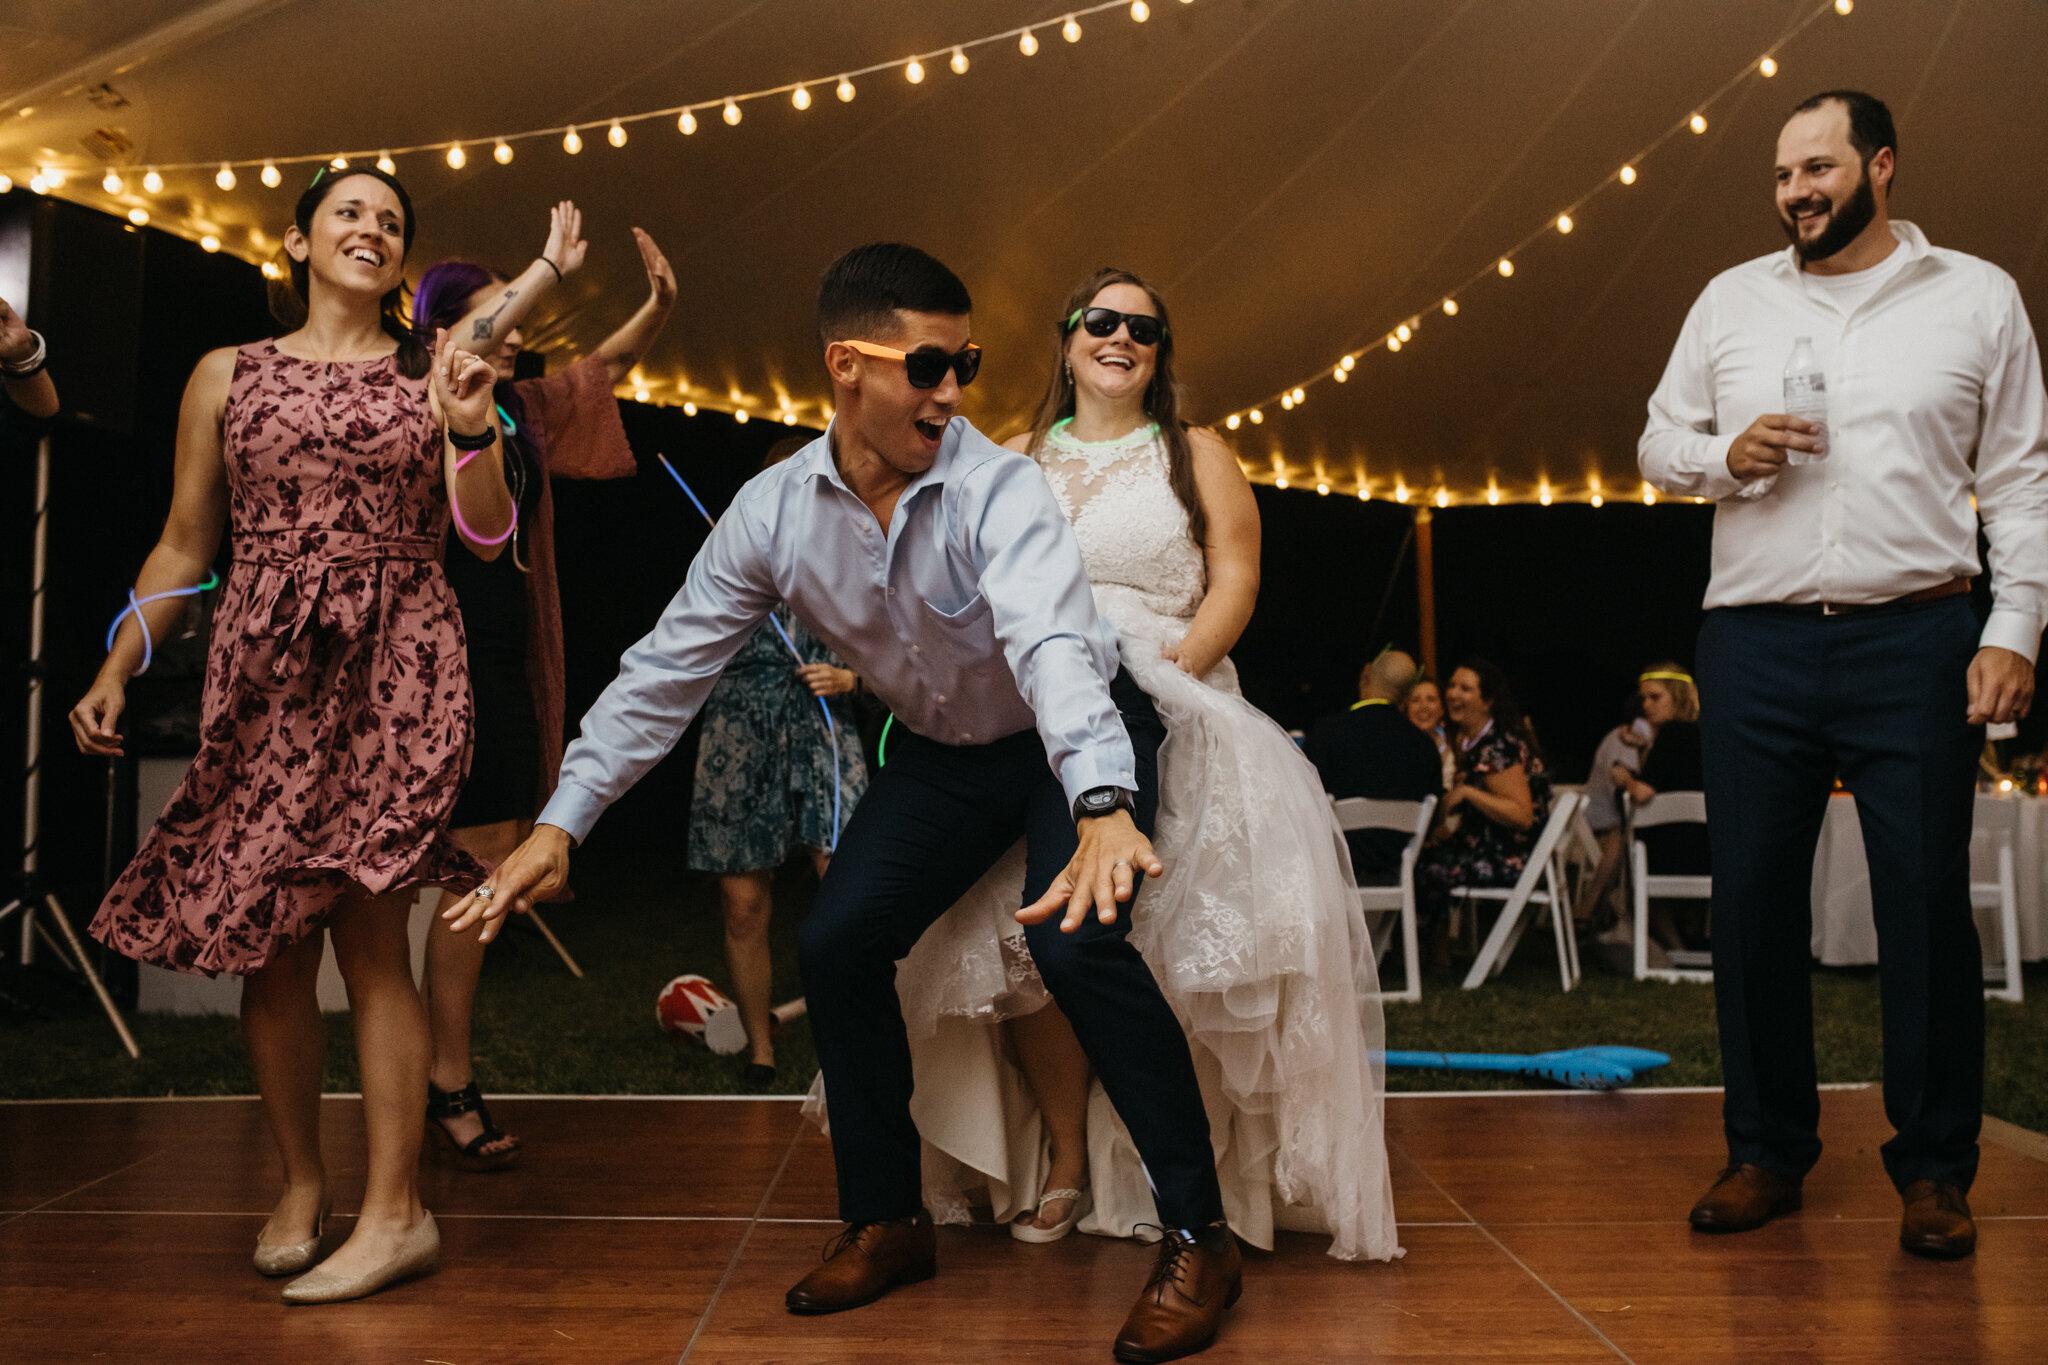 angela_jason_norfolk_wedding-185.jpg